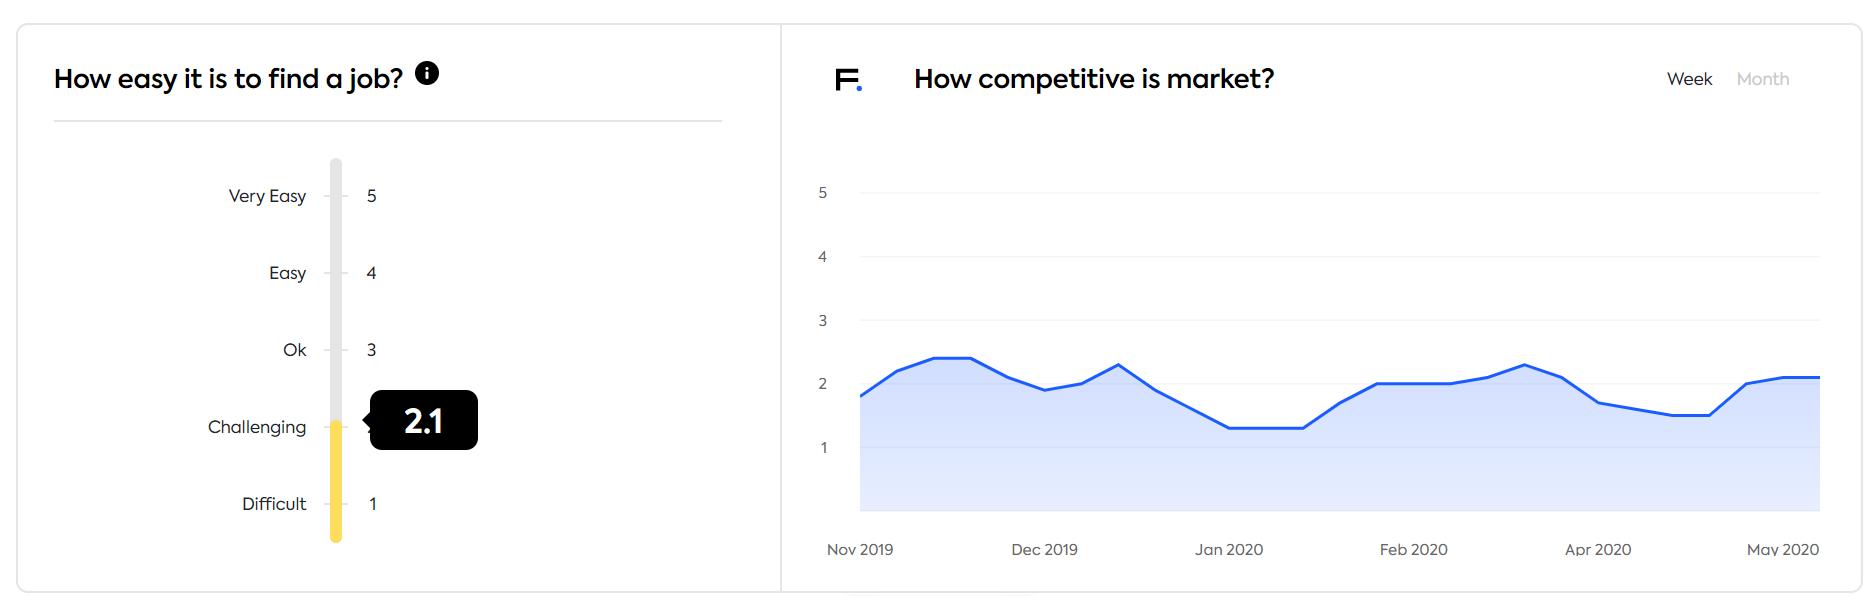 EE market competitiveness marketing pr media